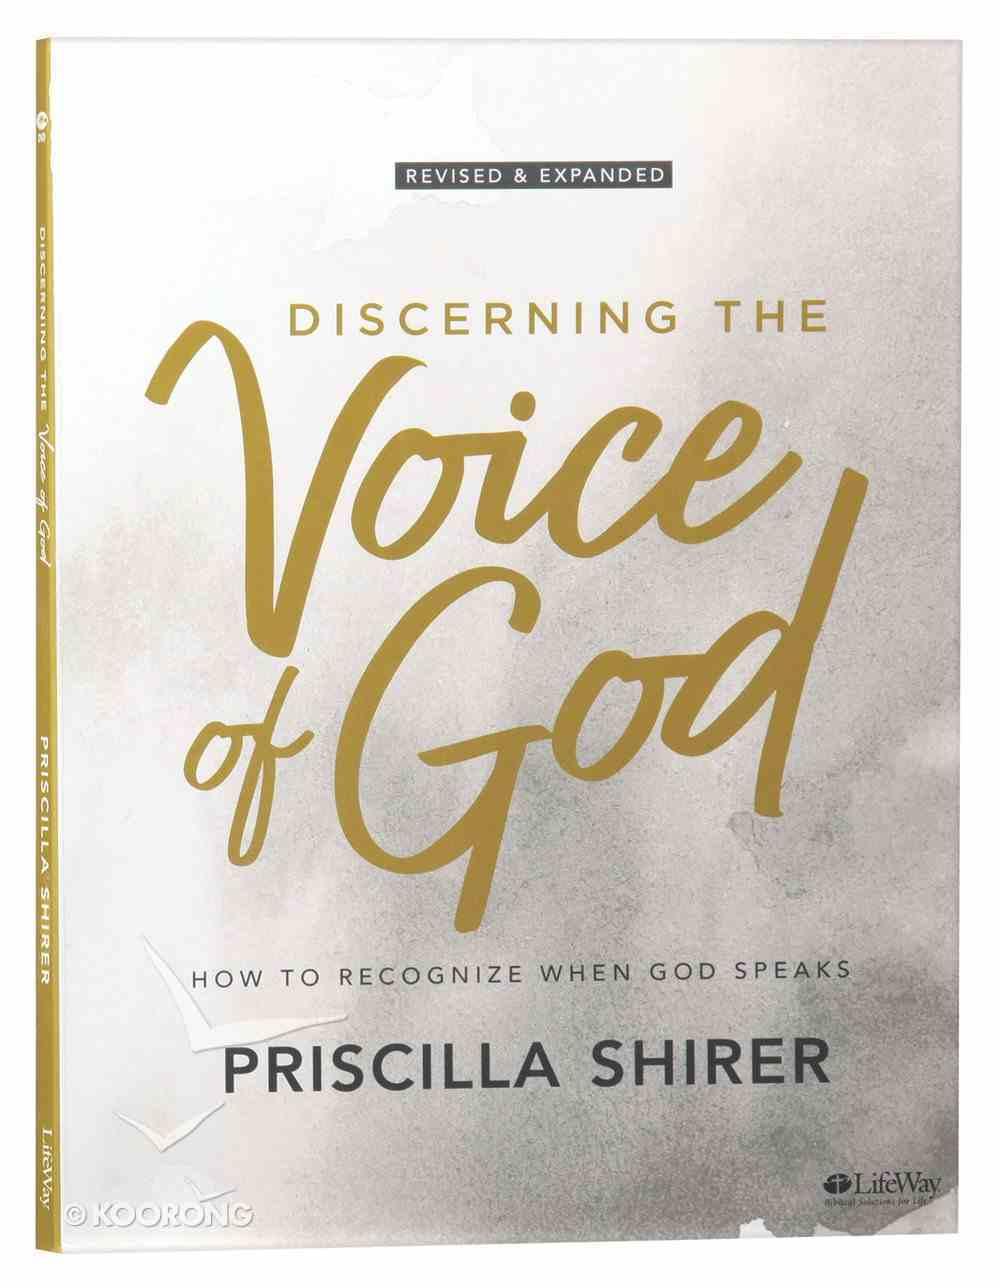 Discerning the Voice of God (2 Dvds) Revised (Dvd Only Set) DVD